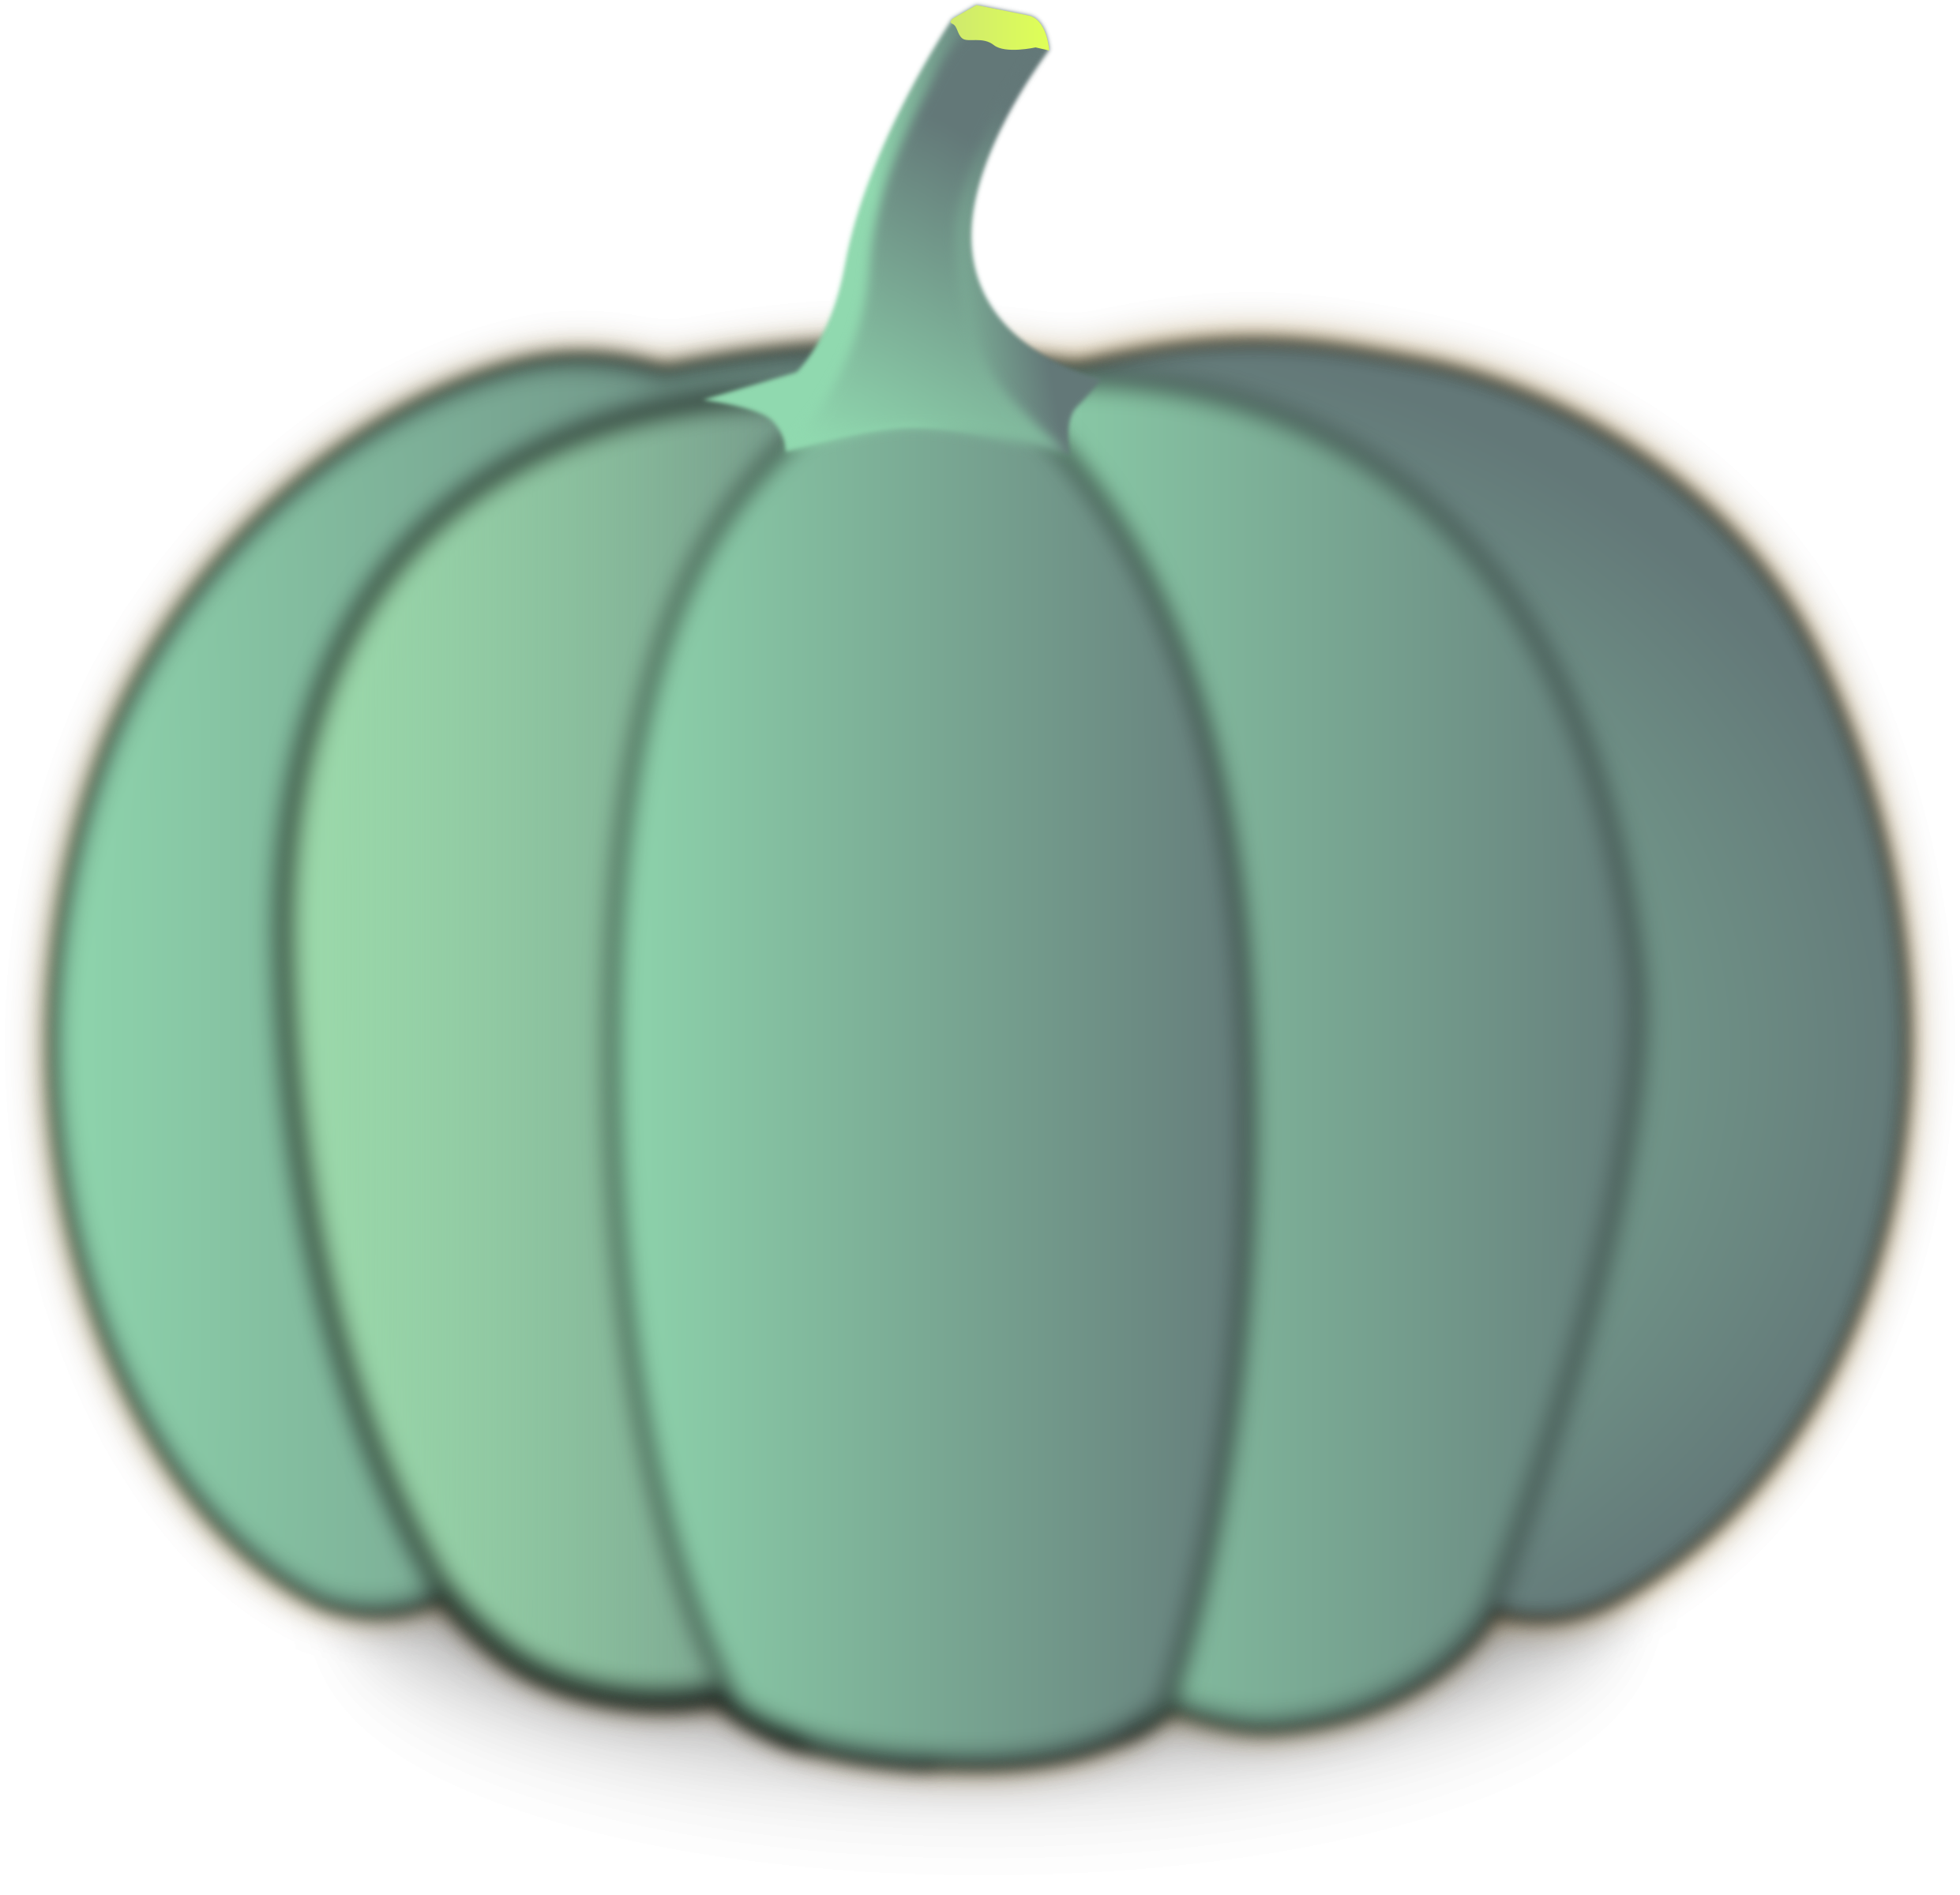 Pumpkin clipart clip art. Green cyberuse library throughout